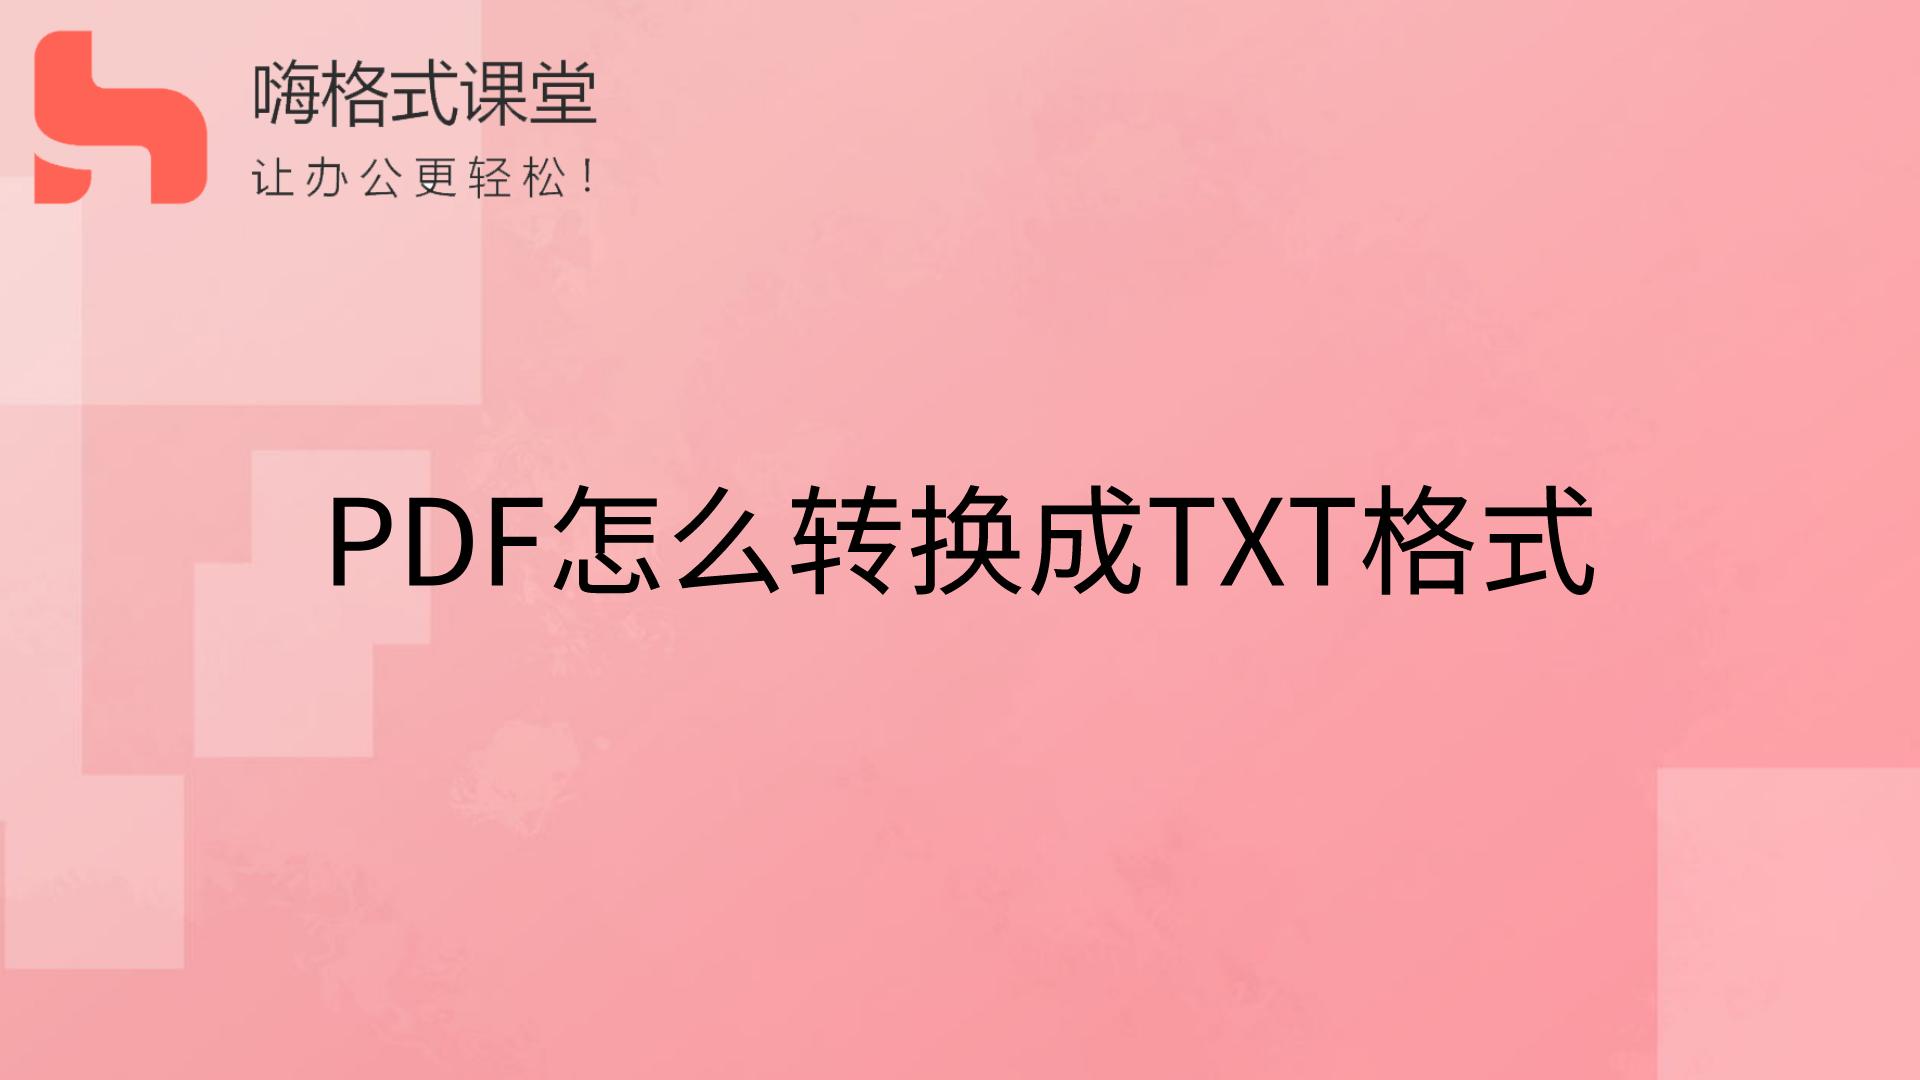 PDF怎么转换成TXT格式